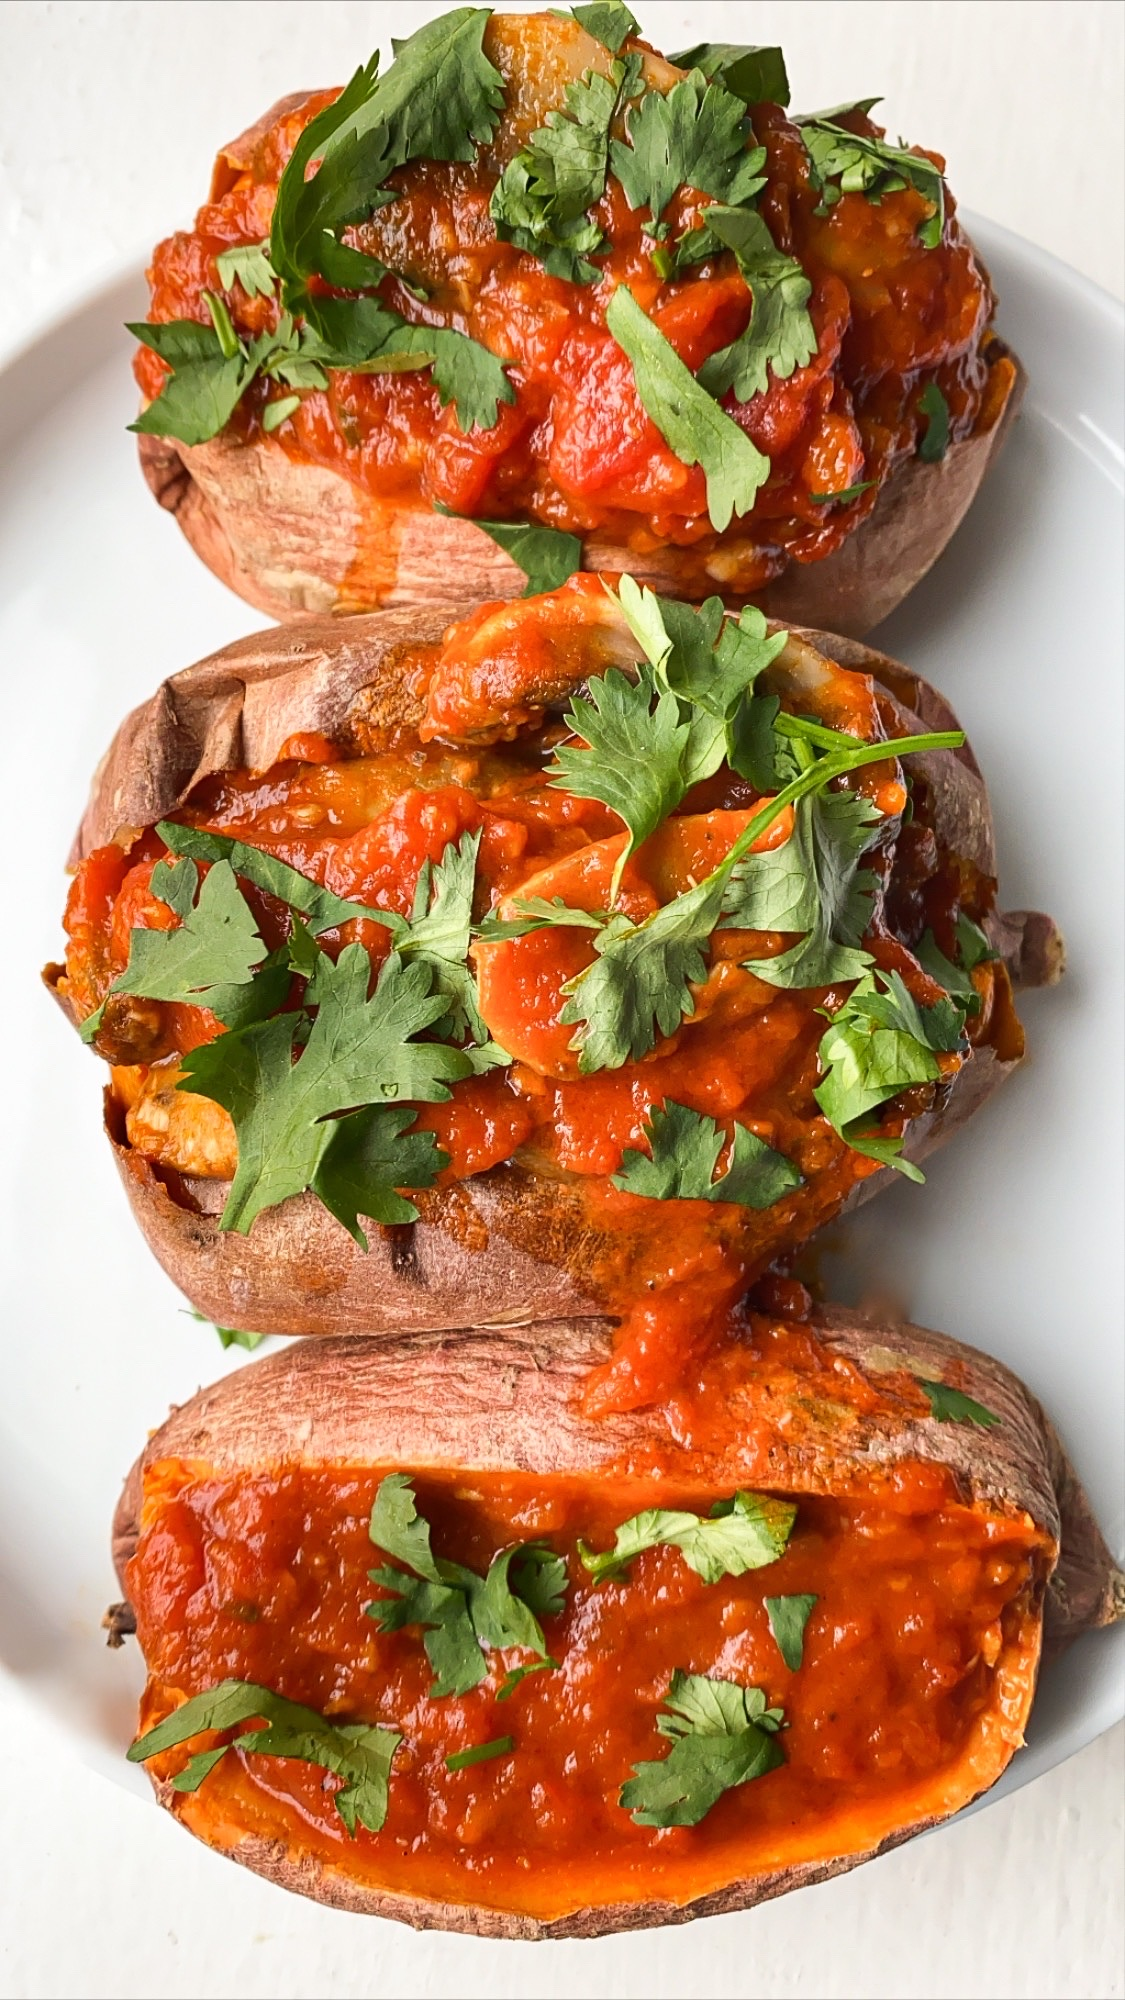 Mushroom Stuffed Sweet Potato